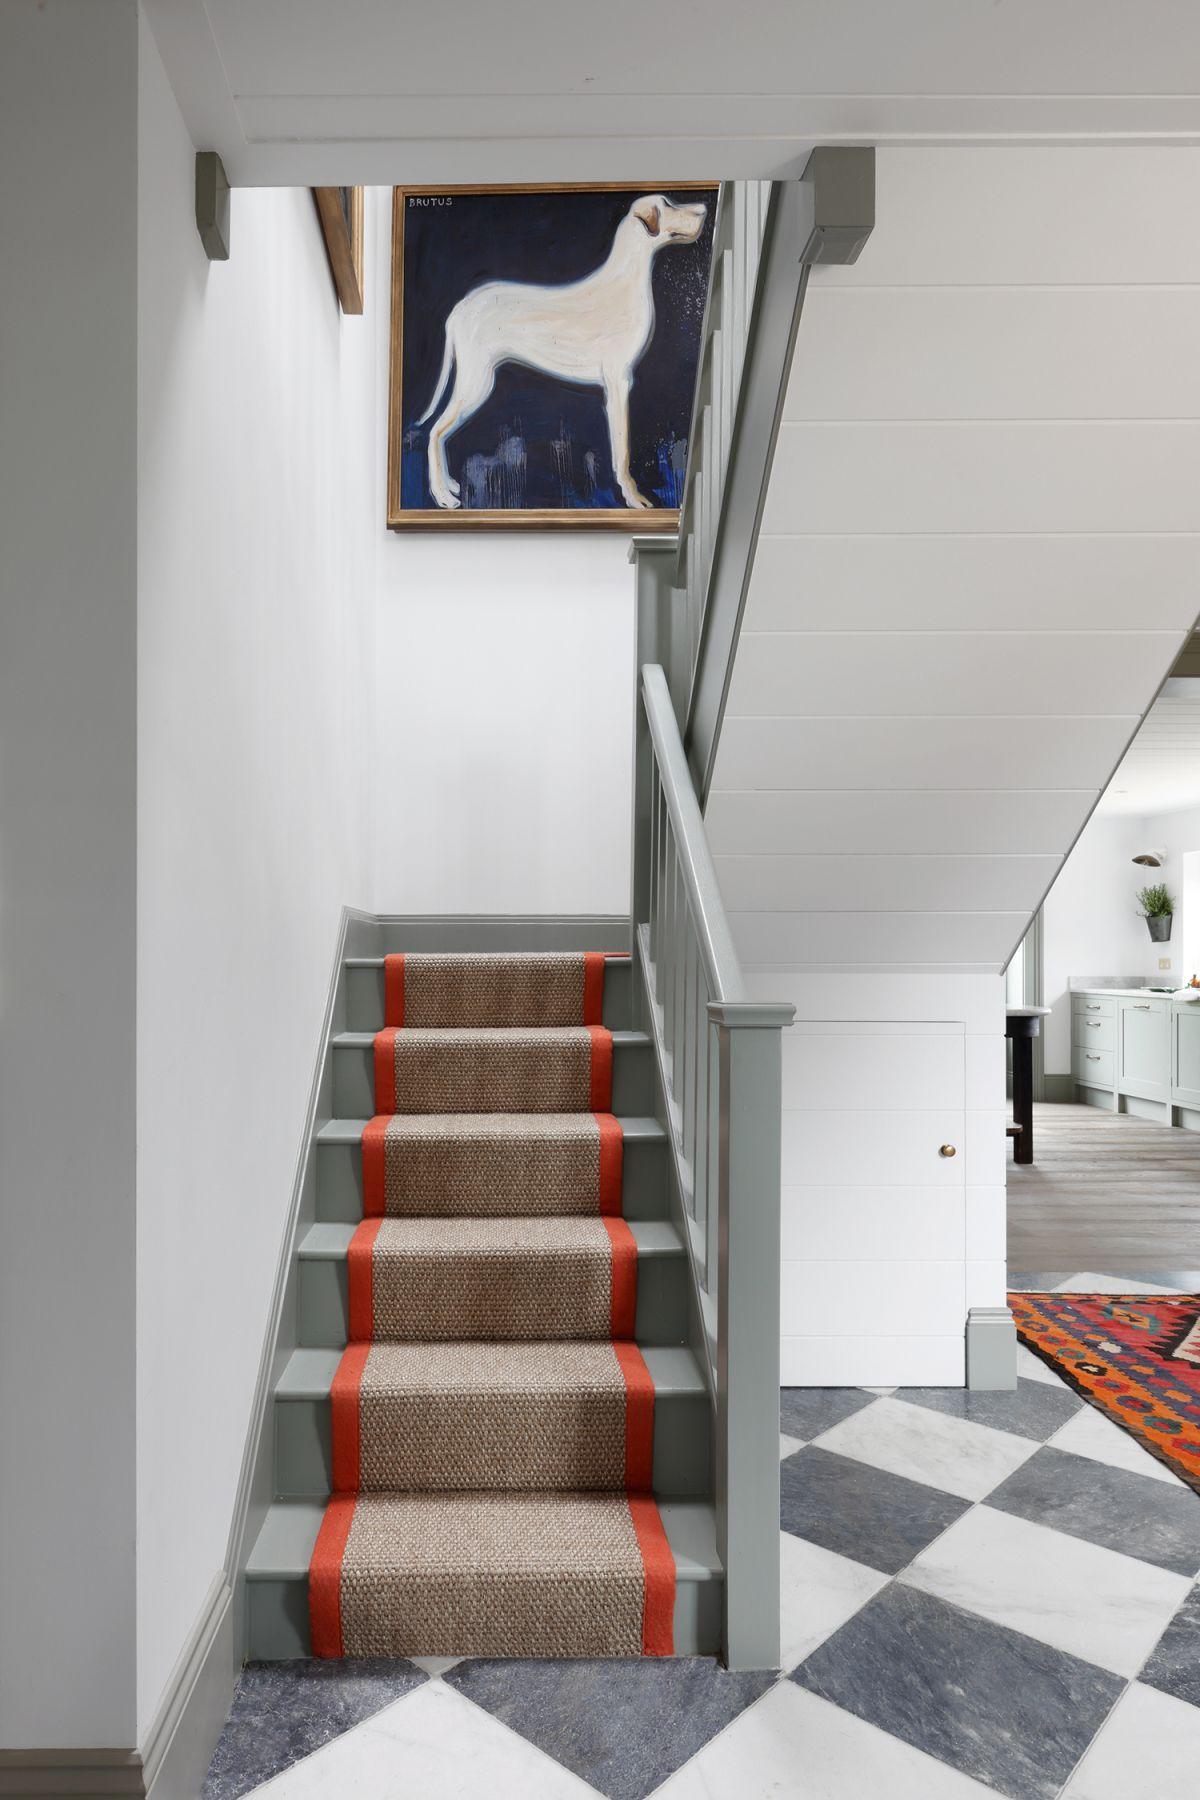 Stair runner ideas – 25 striking stair runner styles for a fresh look